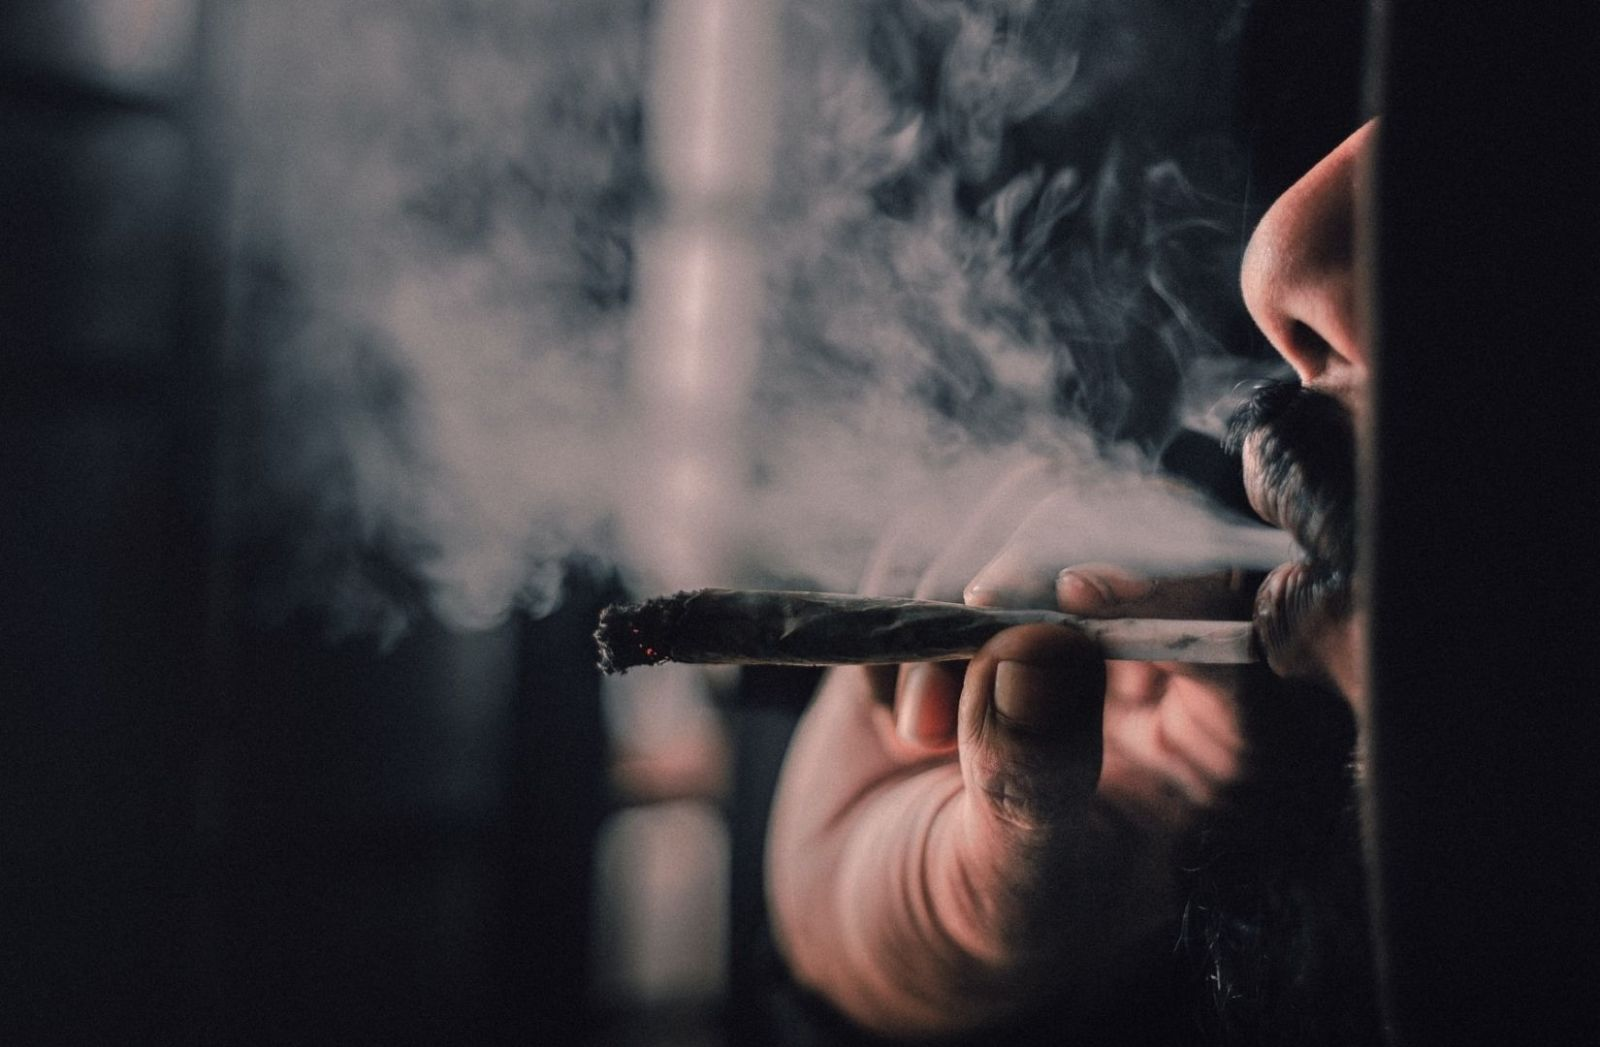 Weed geraucht. (Foto: Ahmed Zayan, Unsplash.com)